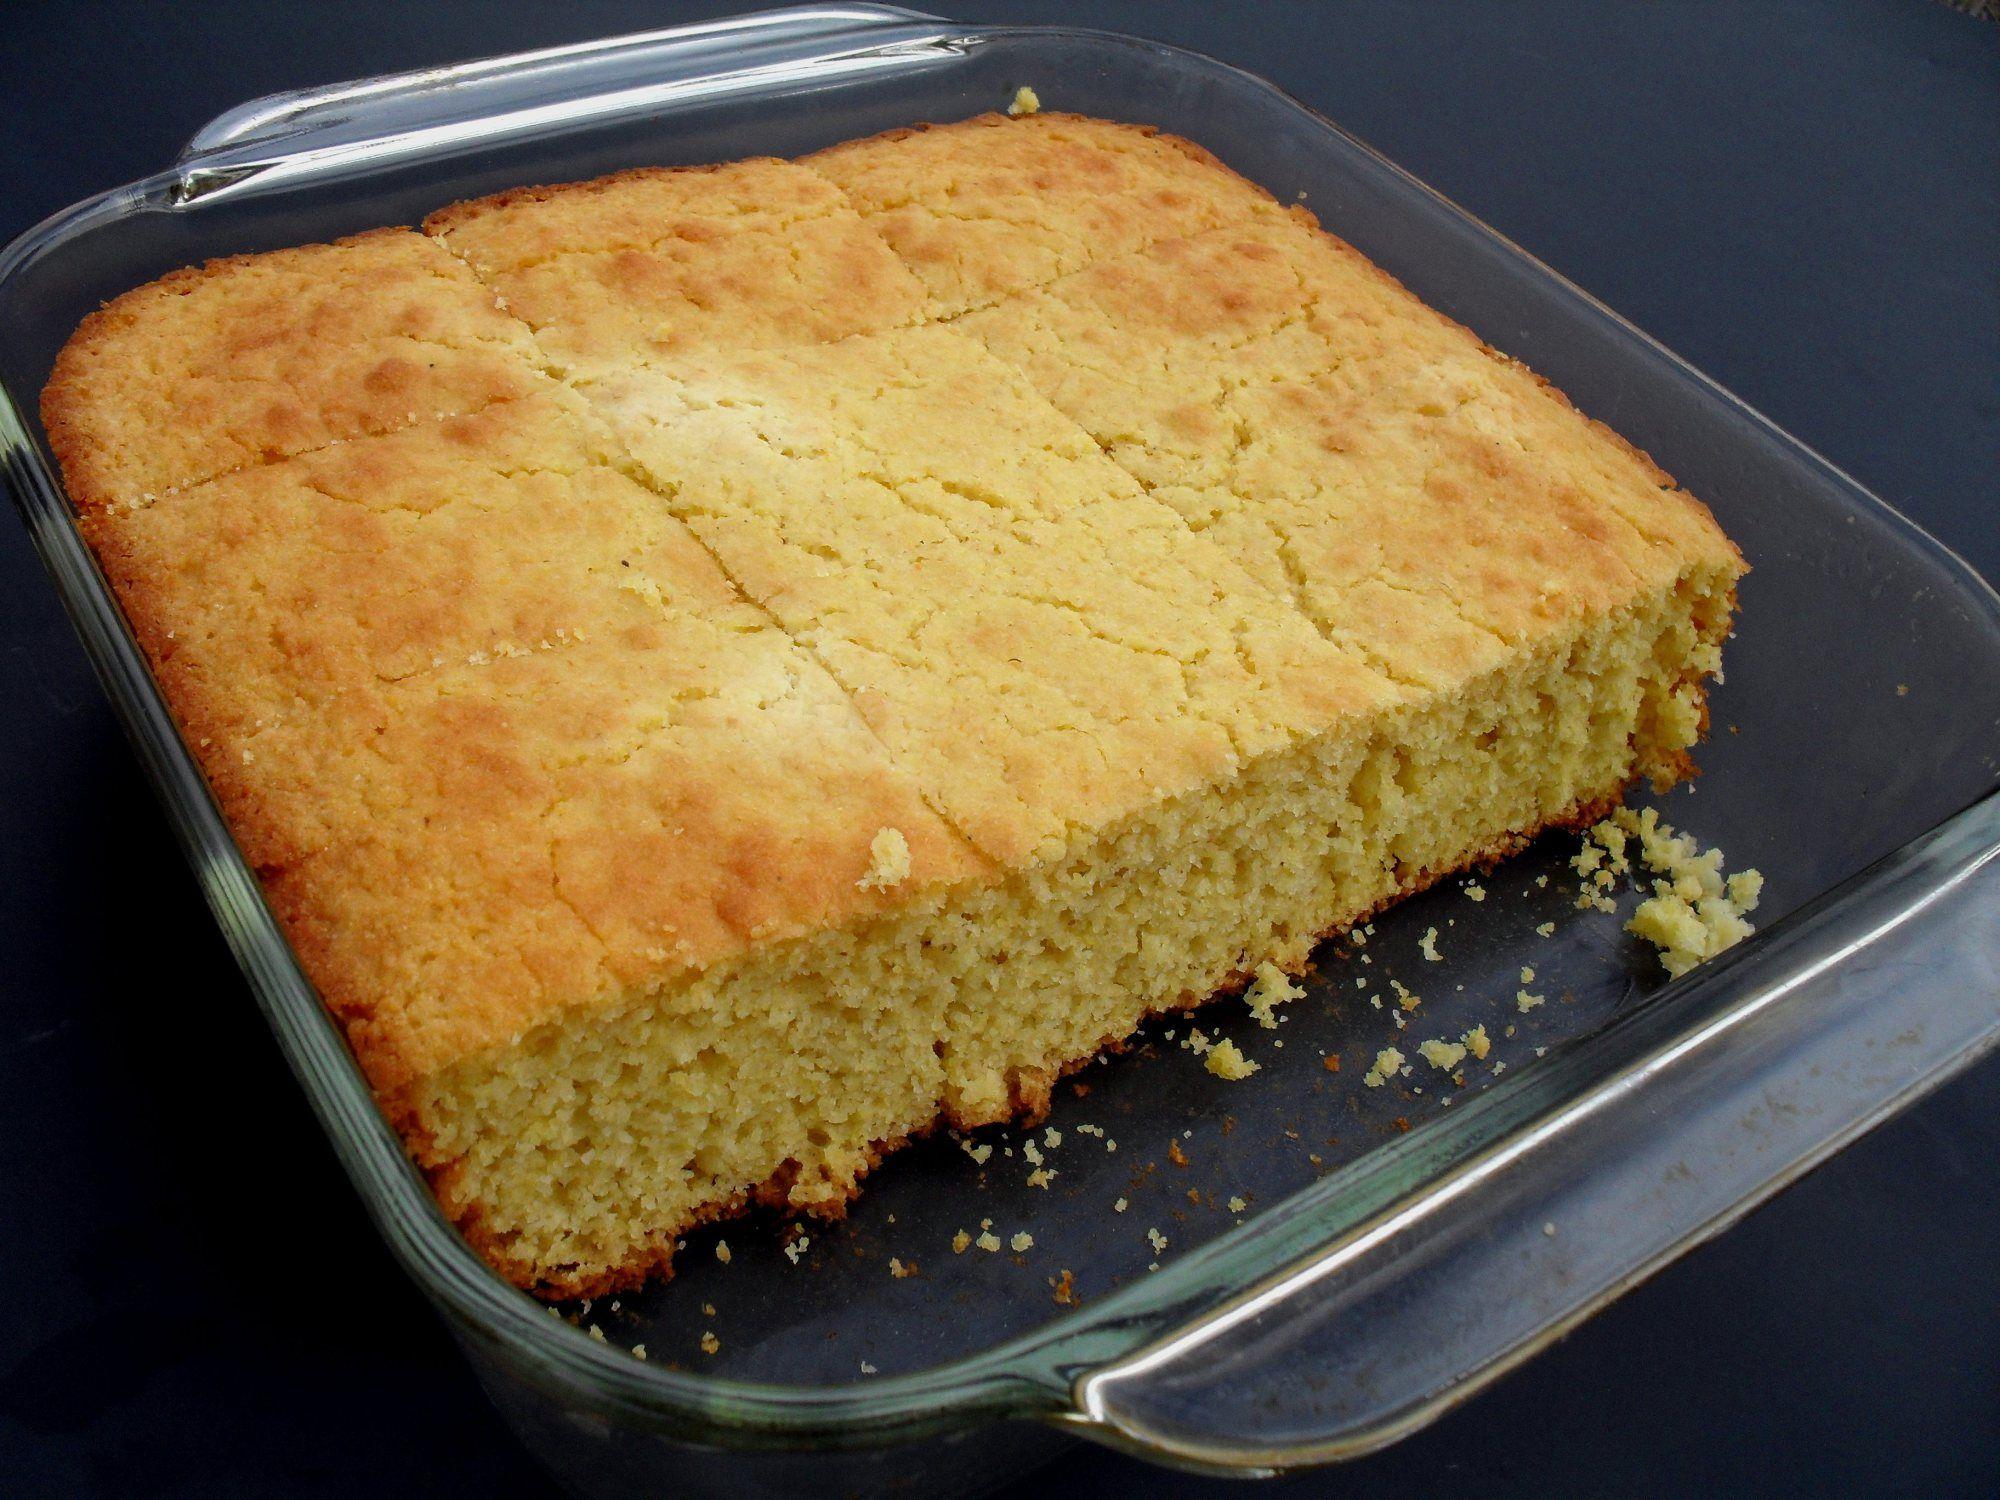 Homestead Cornbread Carbquik Recipes Clean Eating Corn Bread Corn Bread Recipe